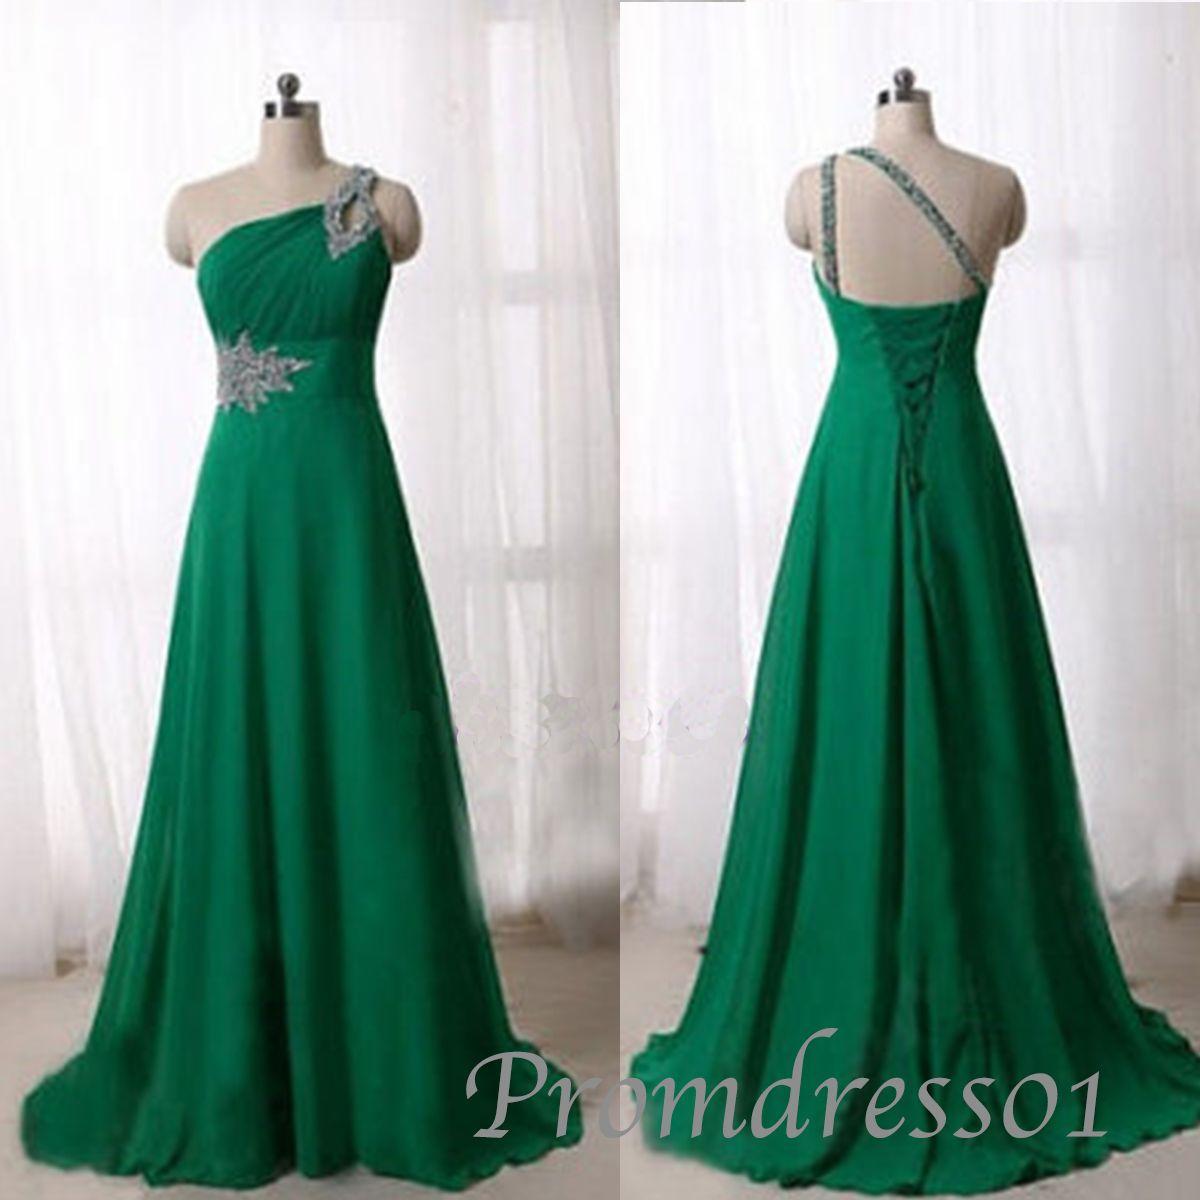 Elegant one shoulder green chiffon prom dress promdress dress